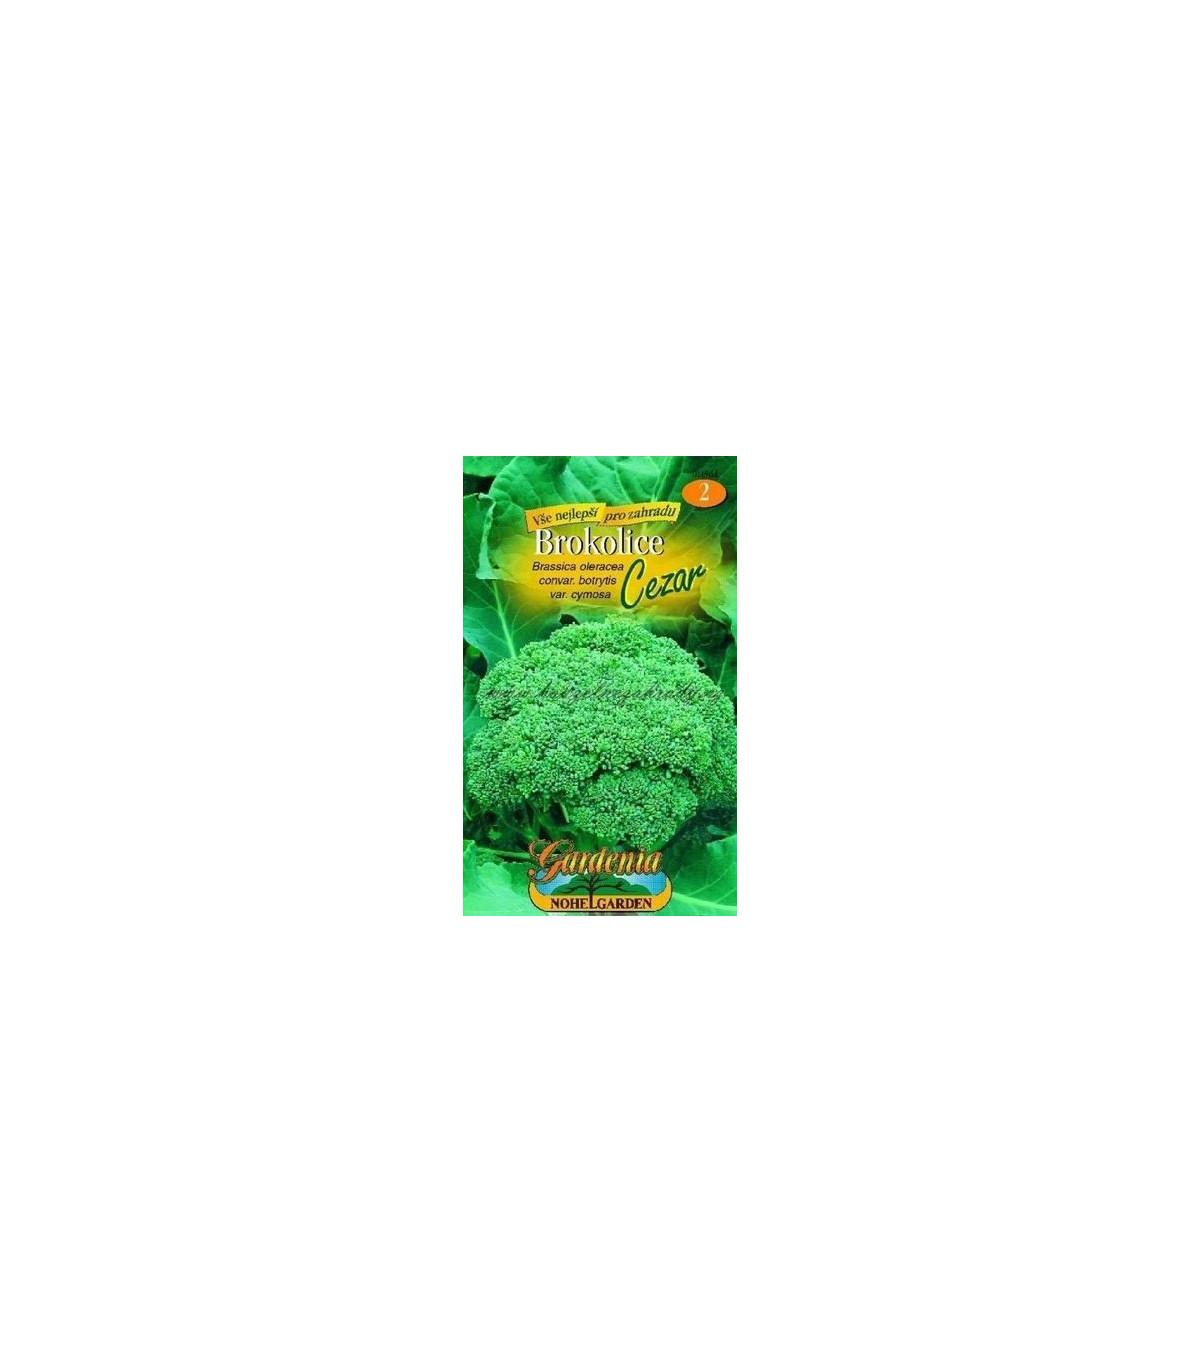 Brokolica Cezar- Brassica oleracea- semená- 120 ks